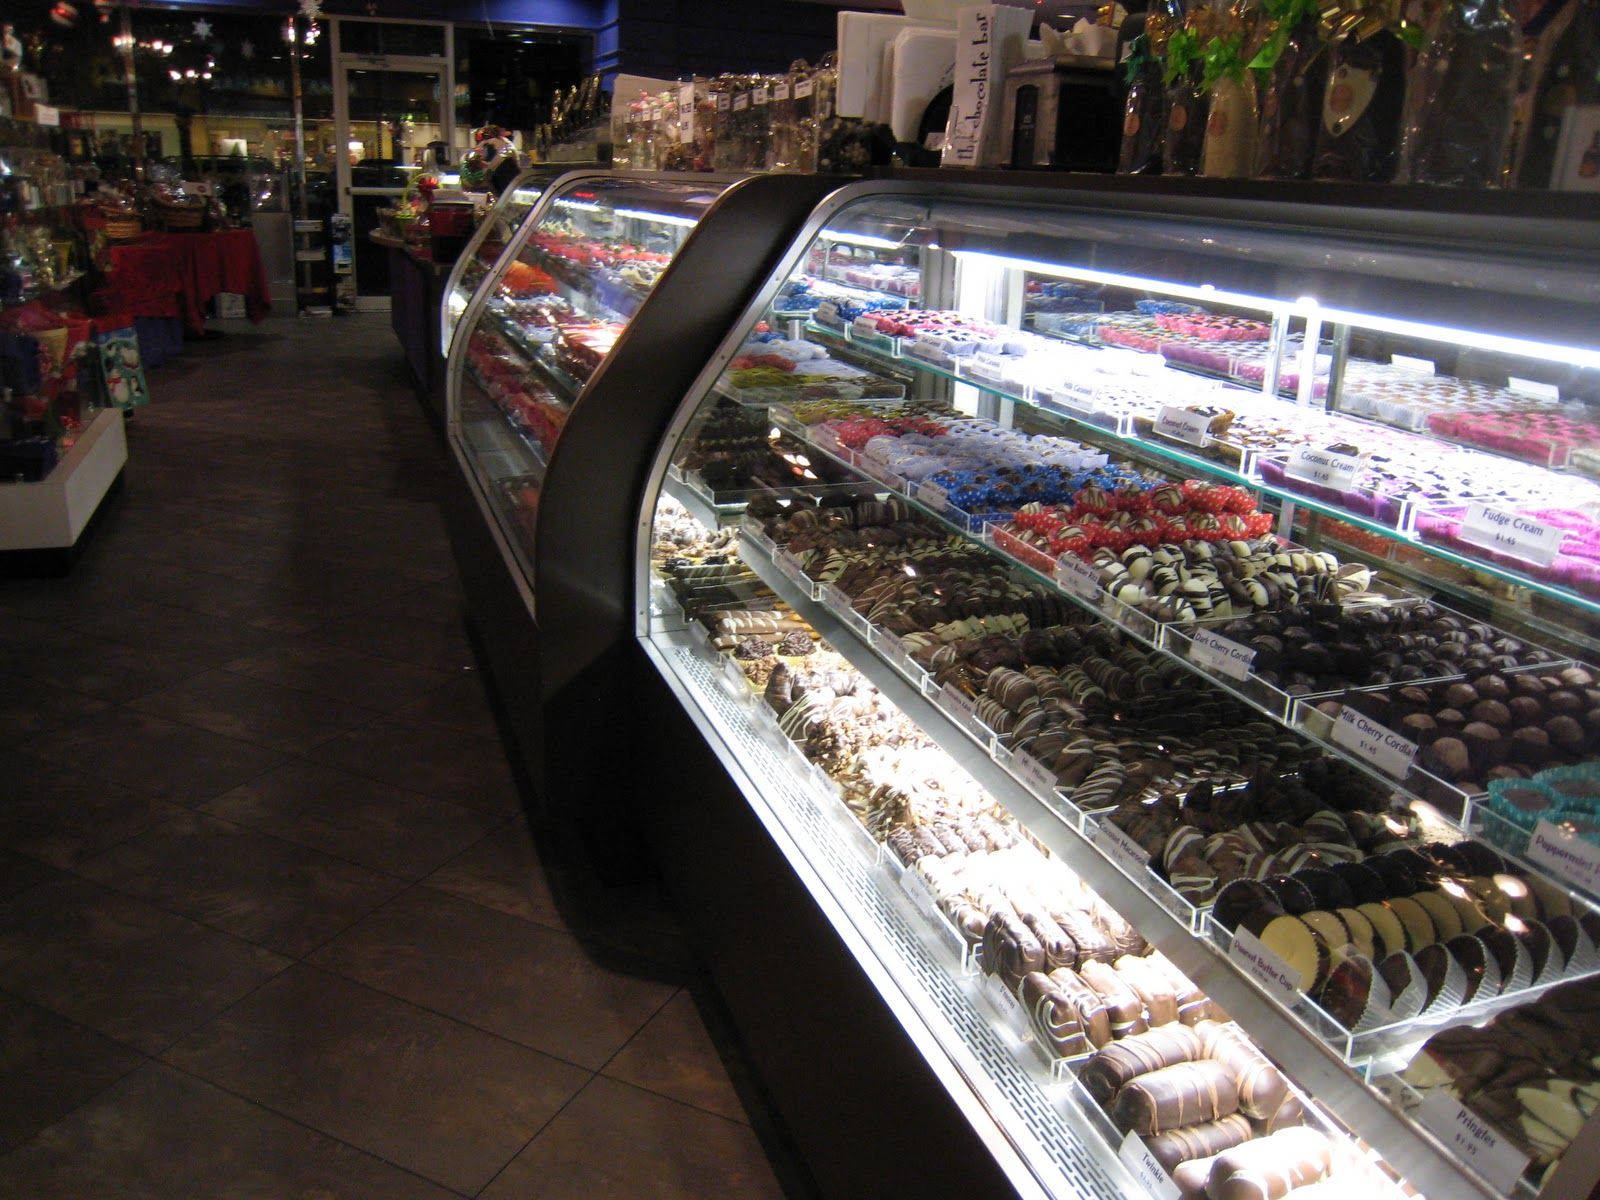 EatMoreChocolate.com: Houston: The Chocolate Bar- Village People